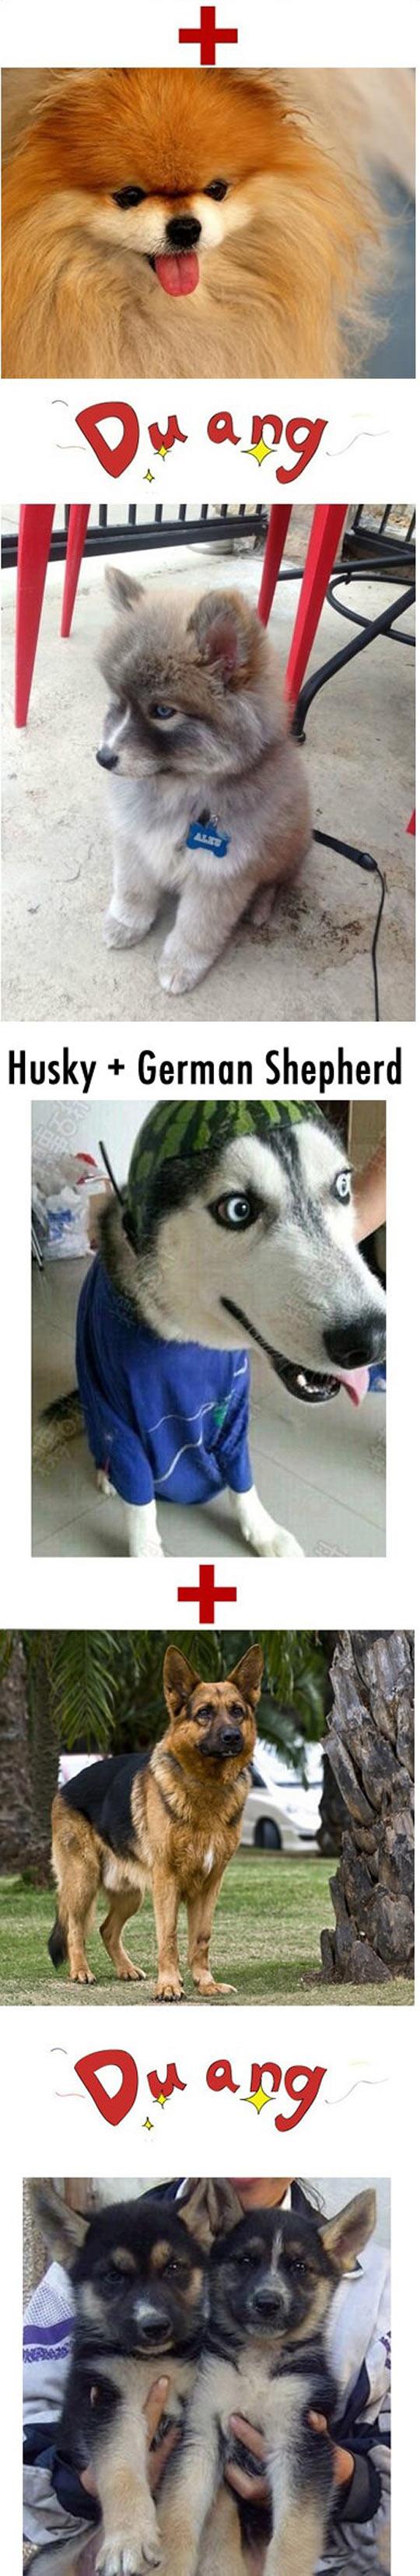 funny-Husky-hybrid-Labrador-Retriever-Shepherd